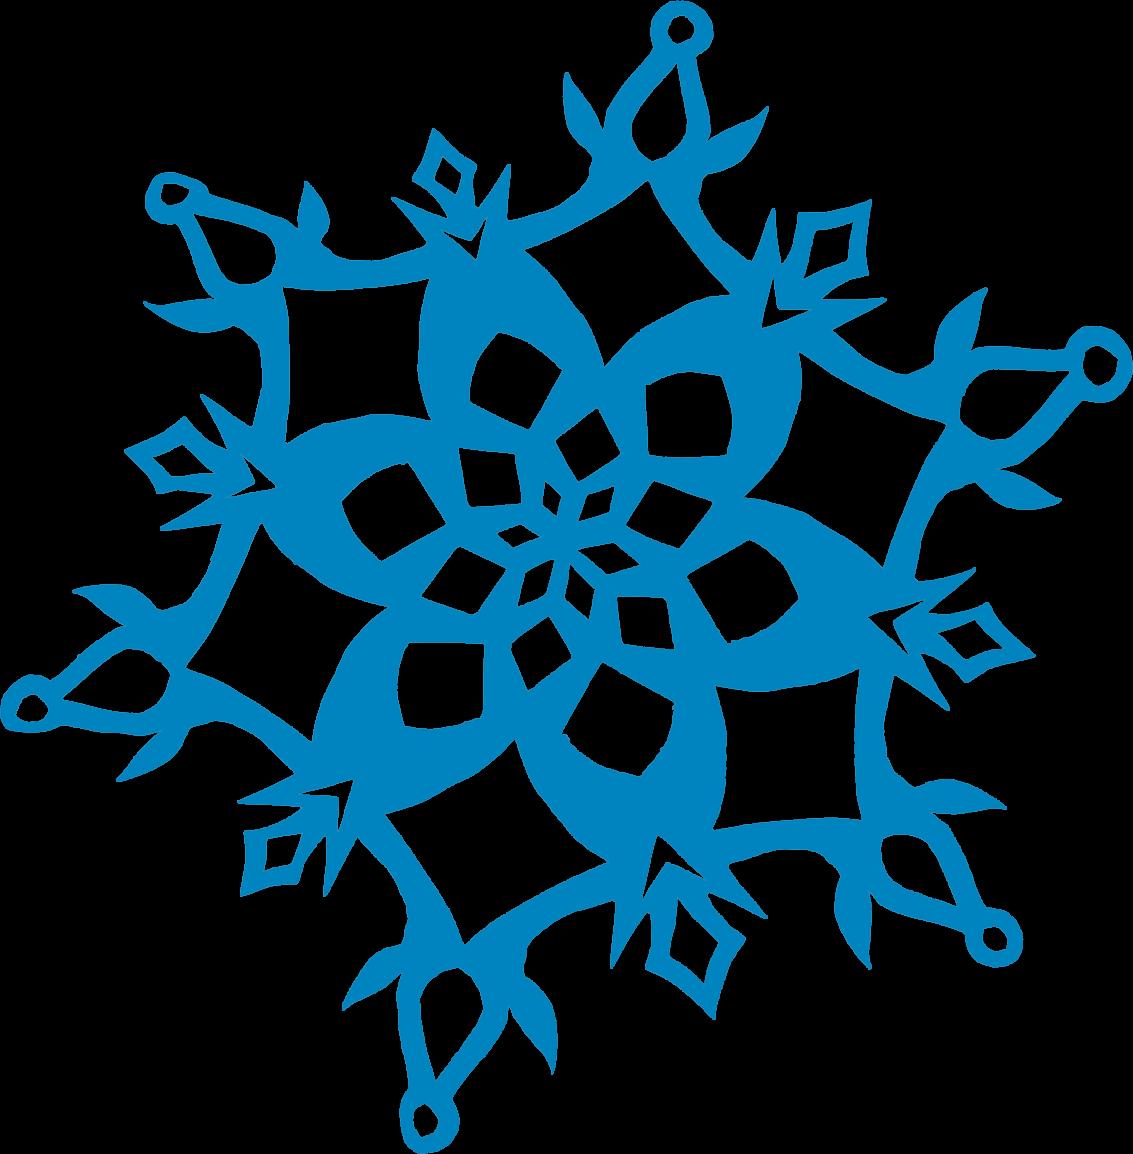 Snowflake cookie clipart image royalty free stock Libella: Shrinky Dink Snowflake Earrings image royalty free stock